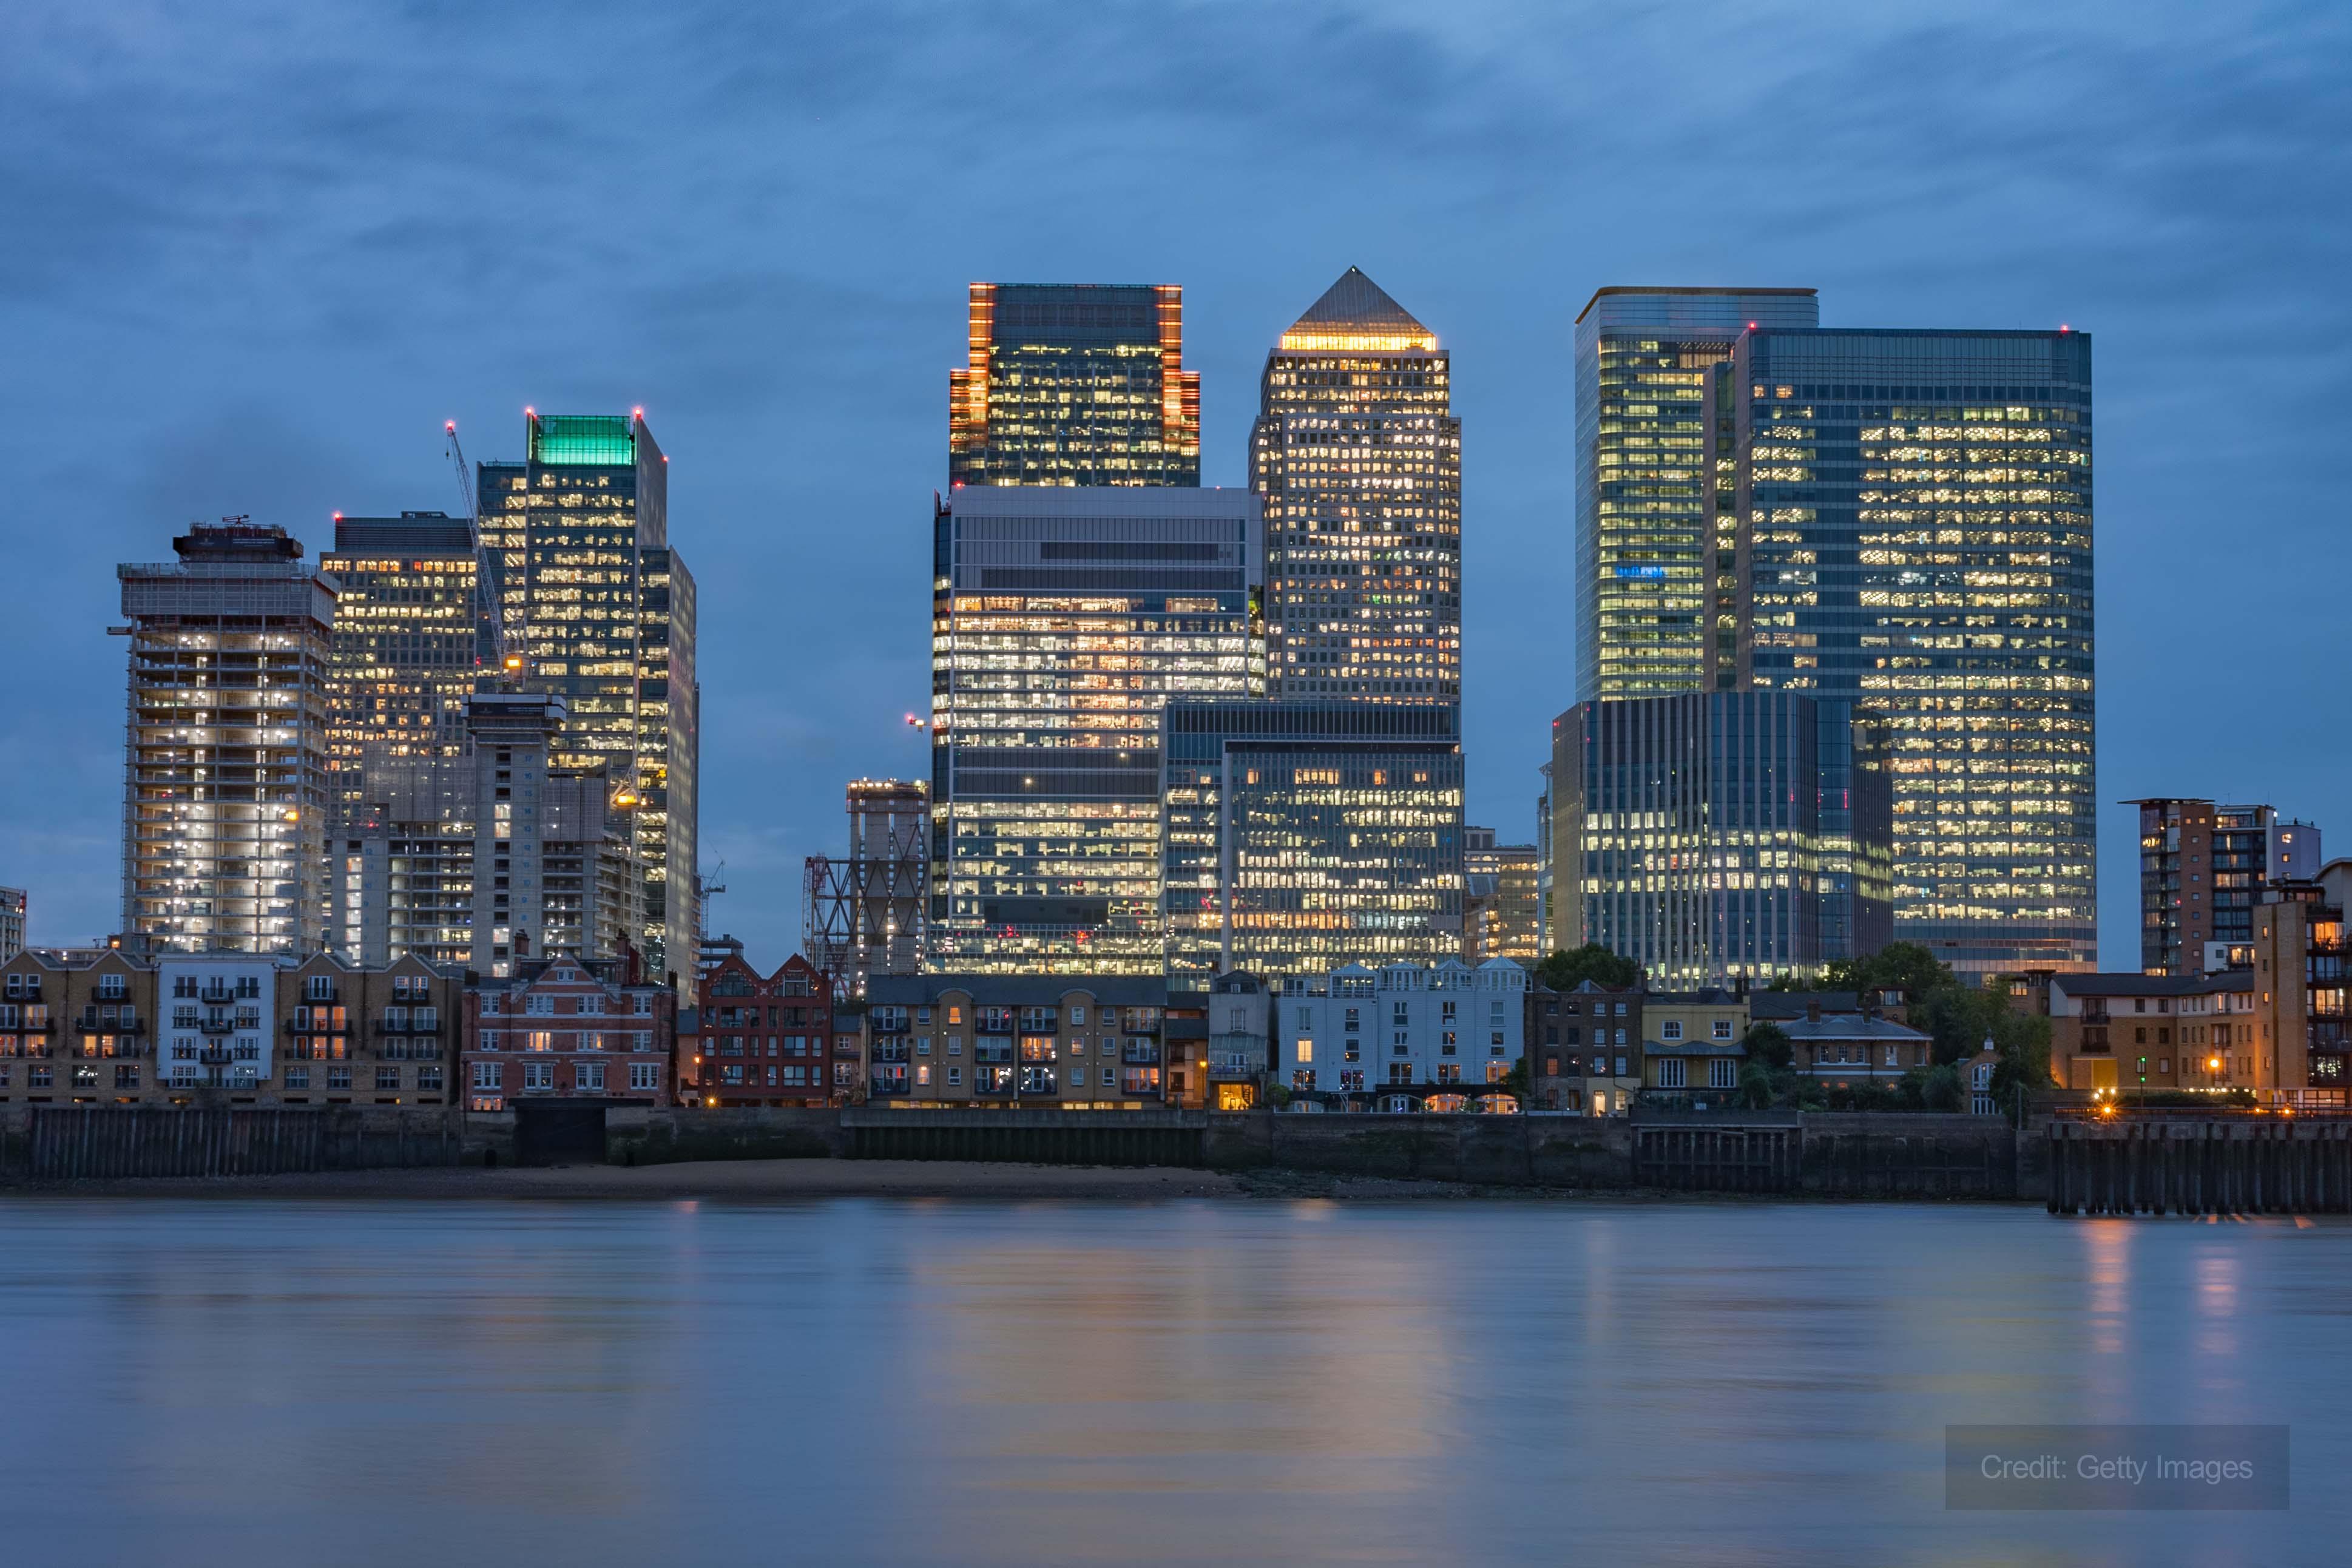 London building site requires dehumidification equipment